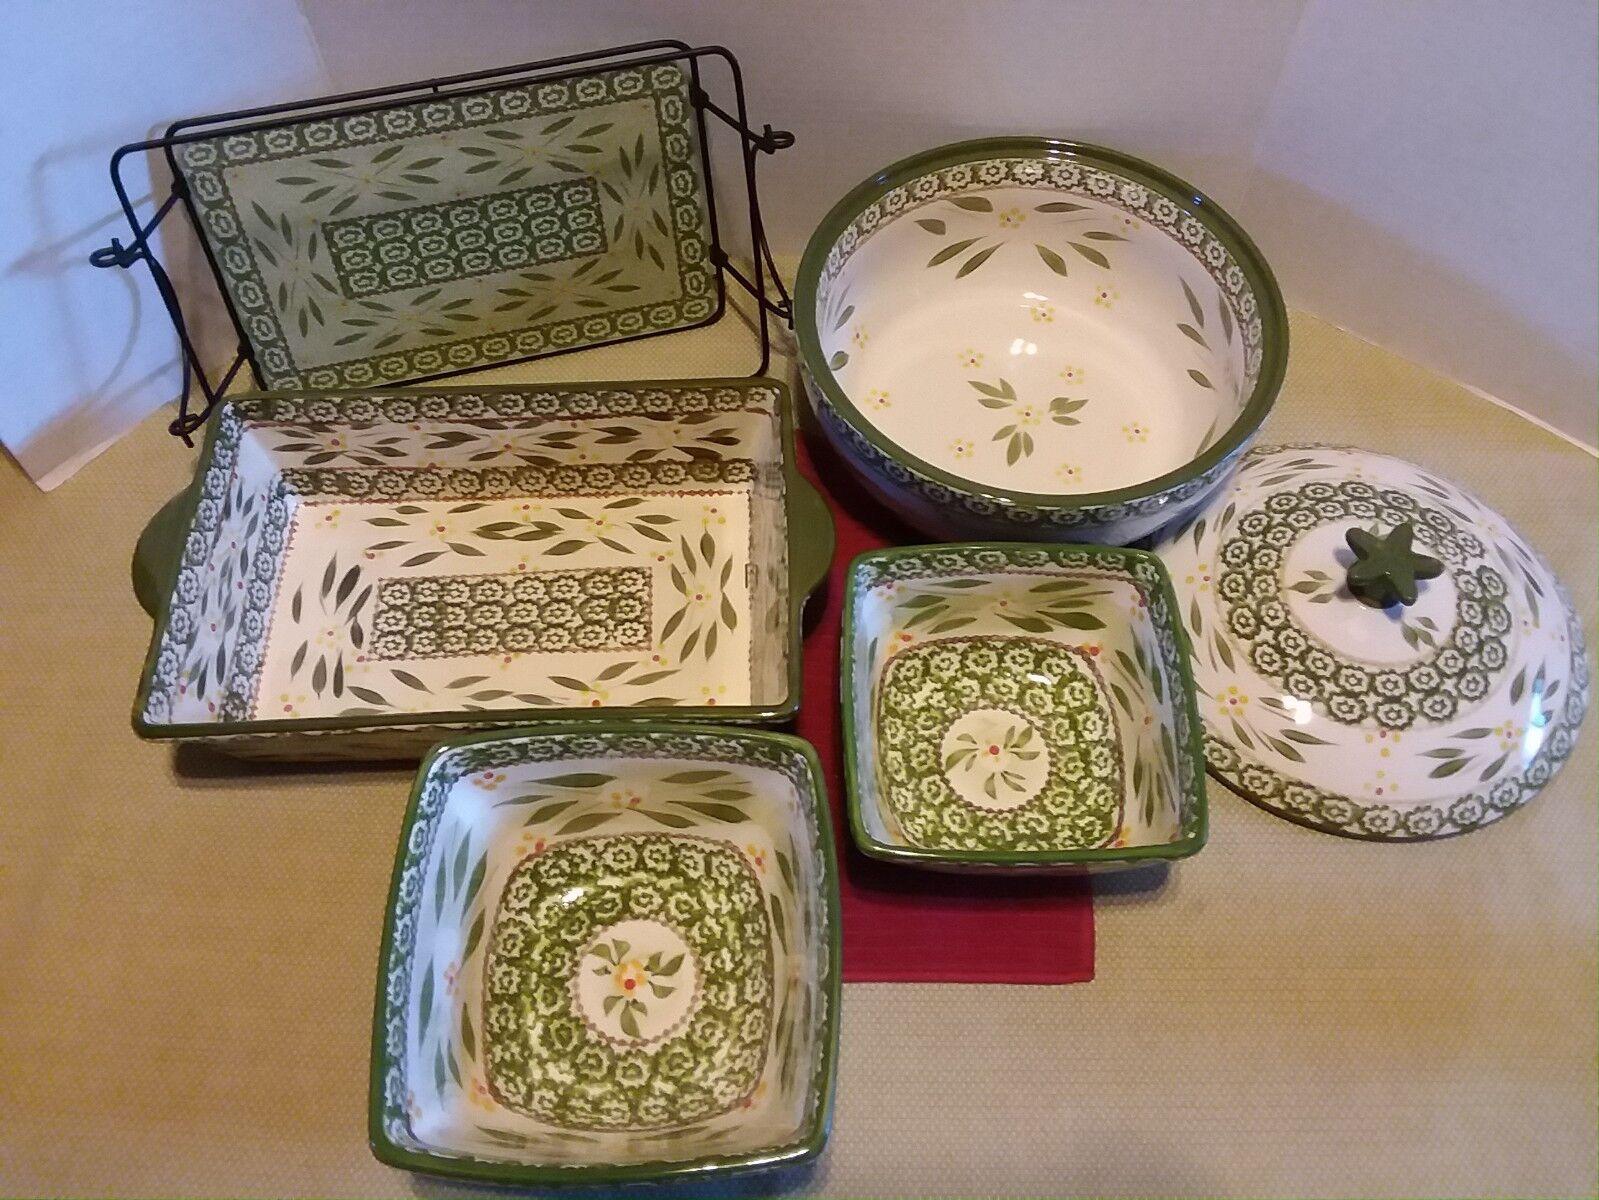 TEMP-tations 7 PC Old World Vert Ensemble d'Ustensiles de Cuisson Baking Set Cookware